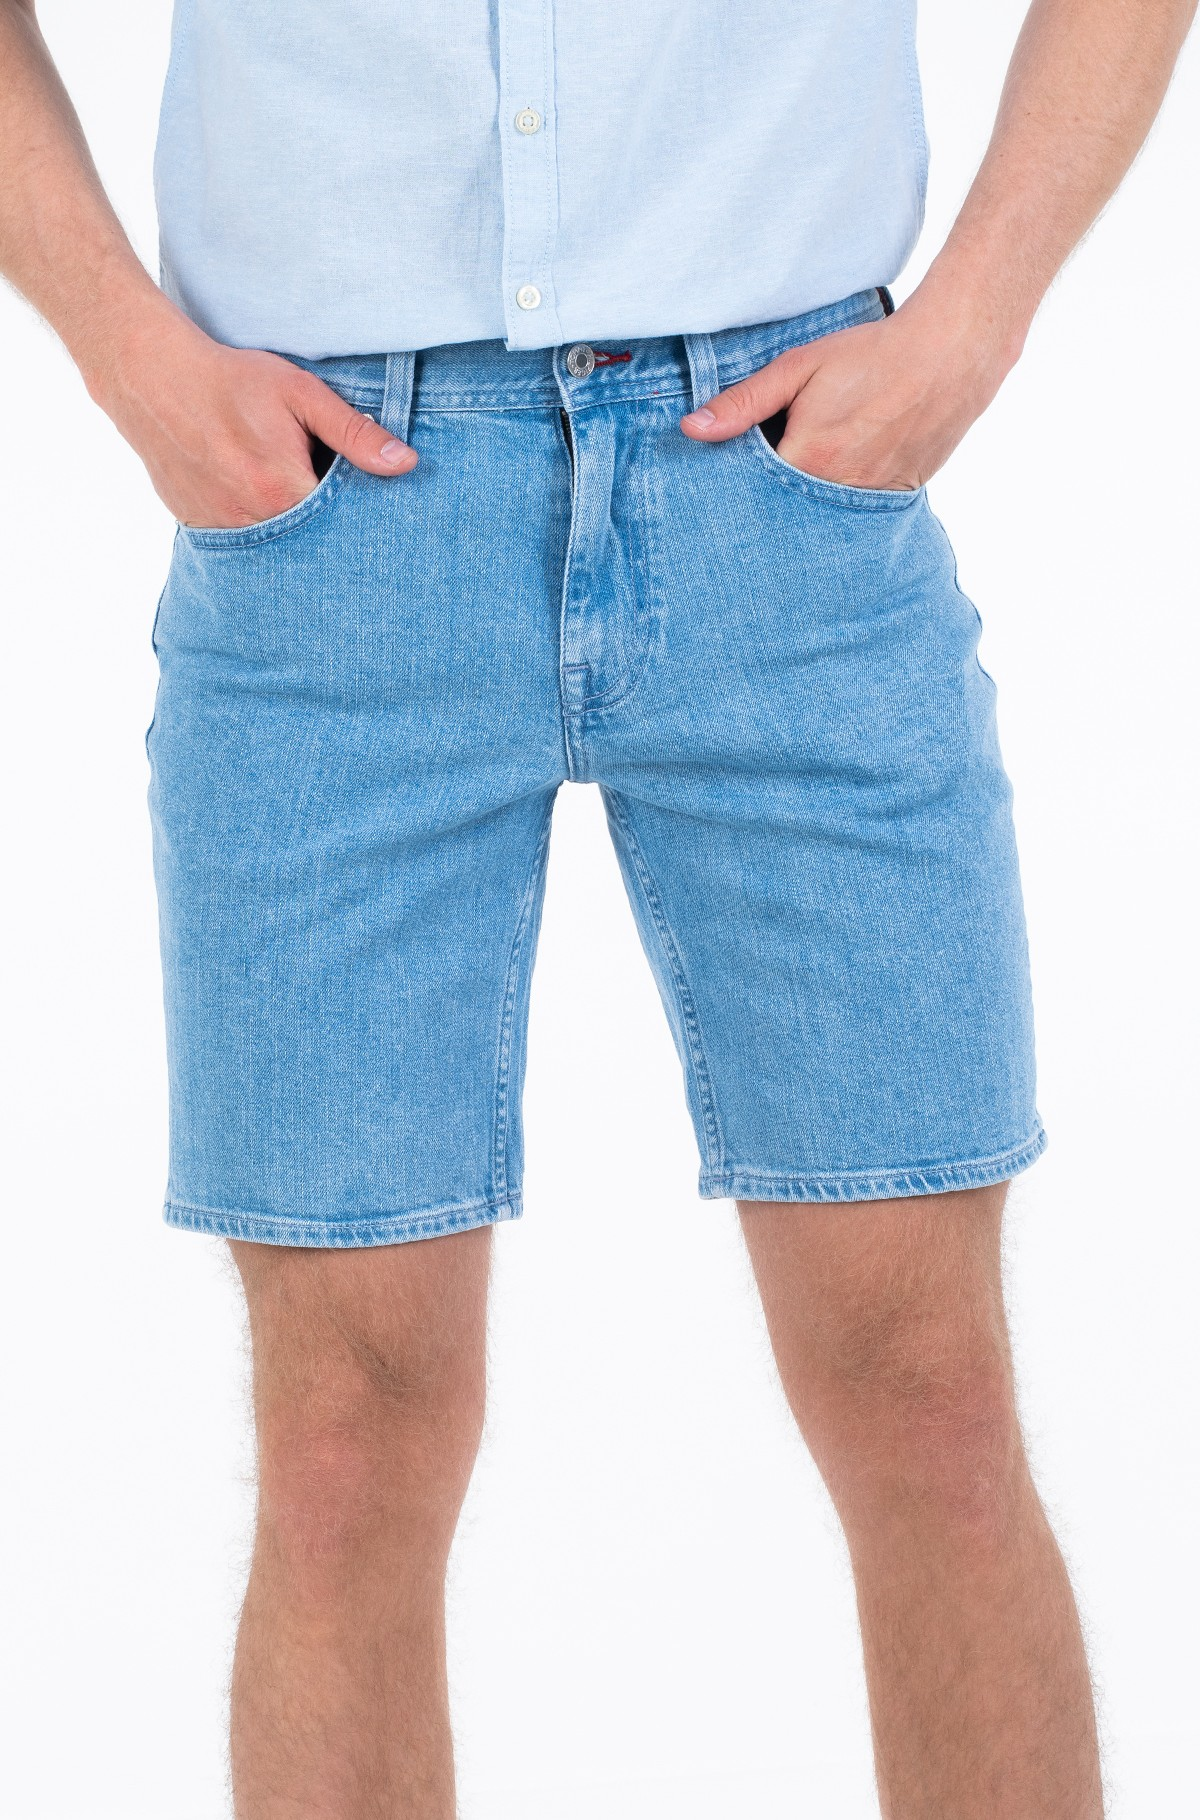 Shorts BROOKLYN 5PKT SHORT ALTON BLUE-full-1